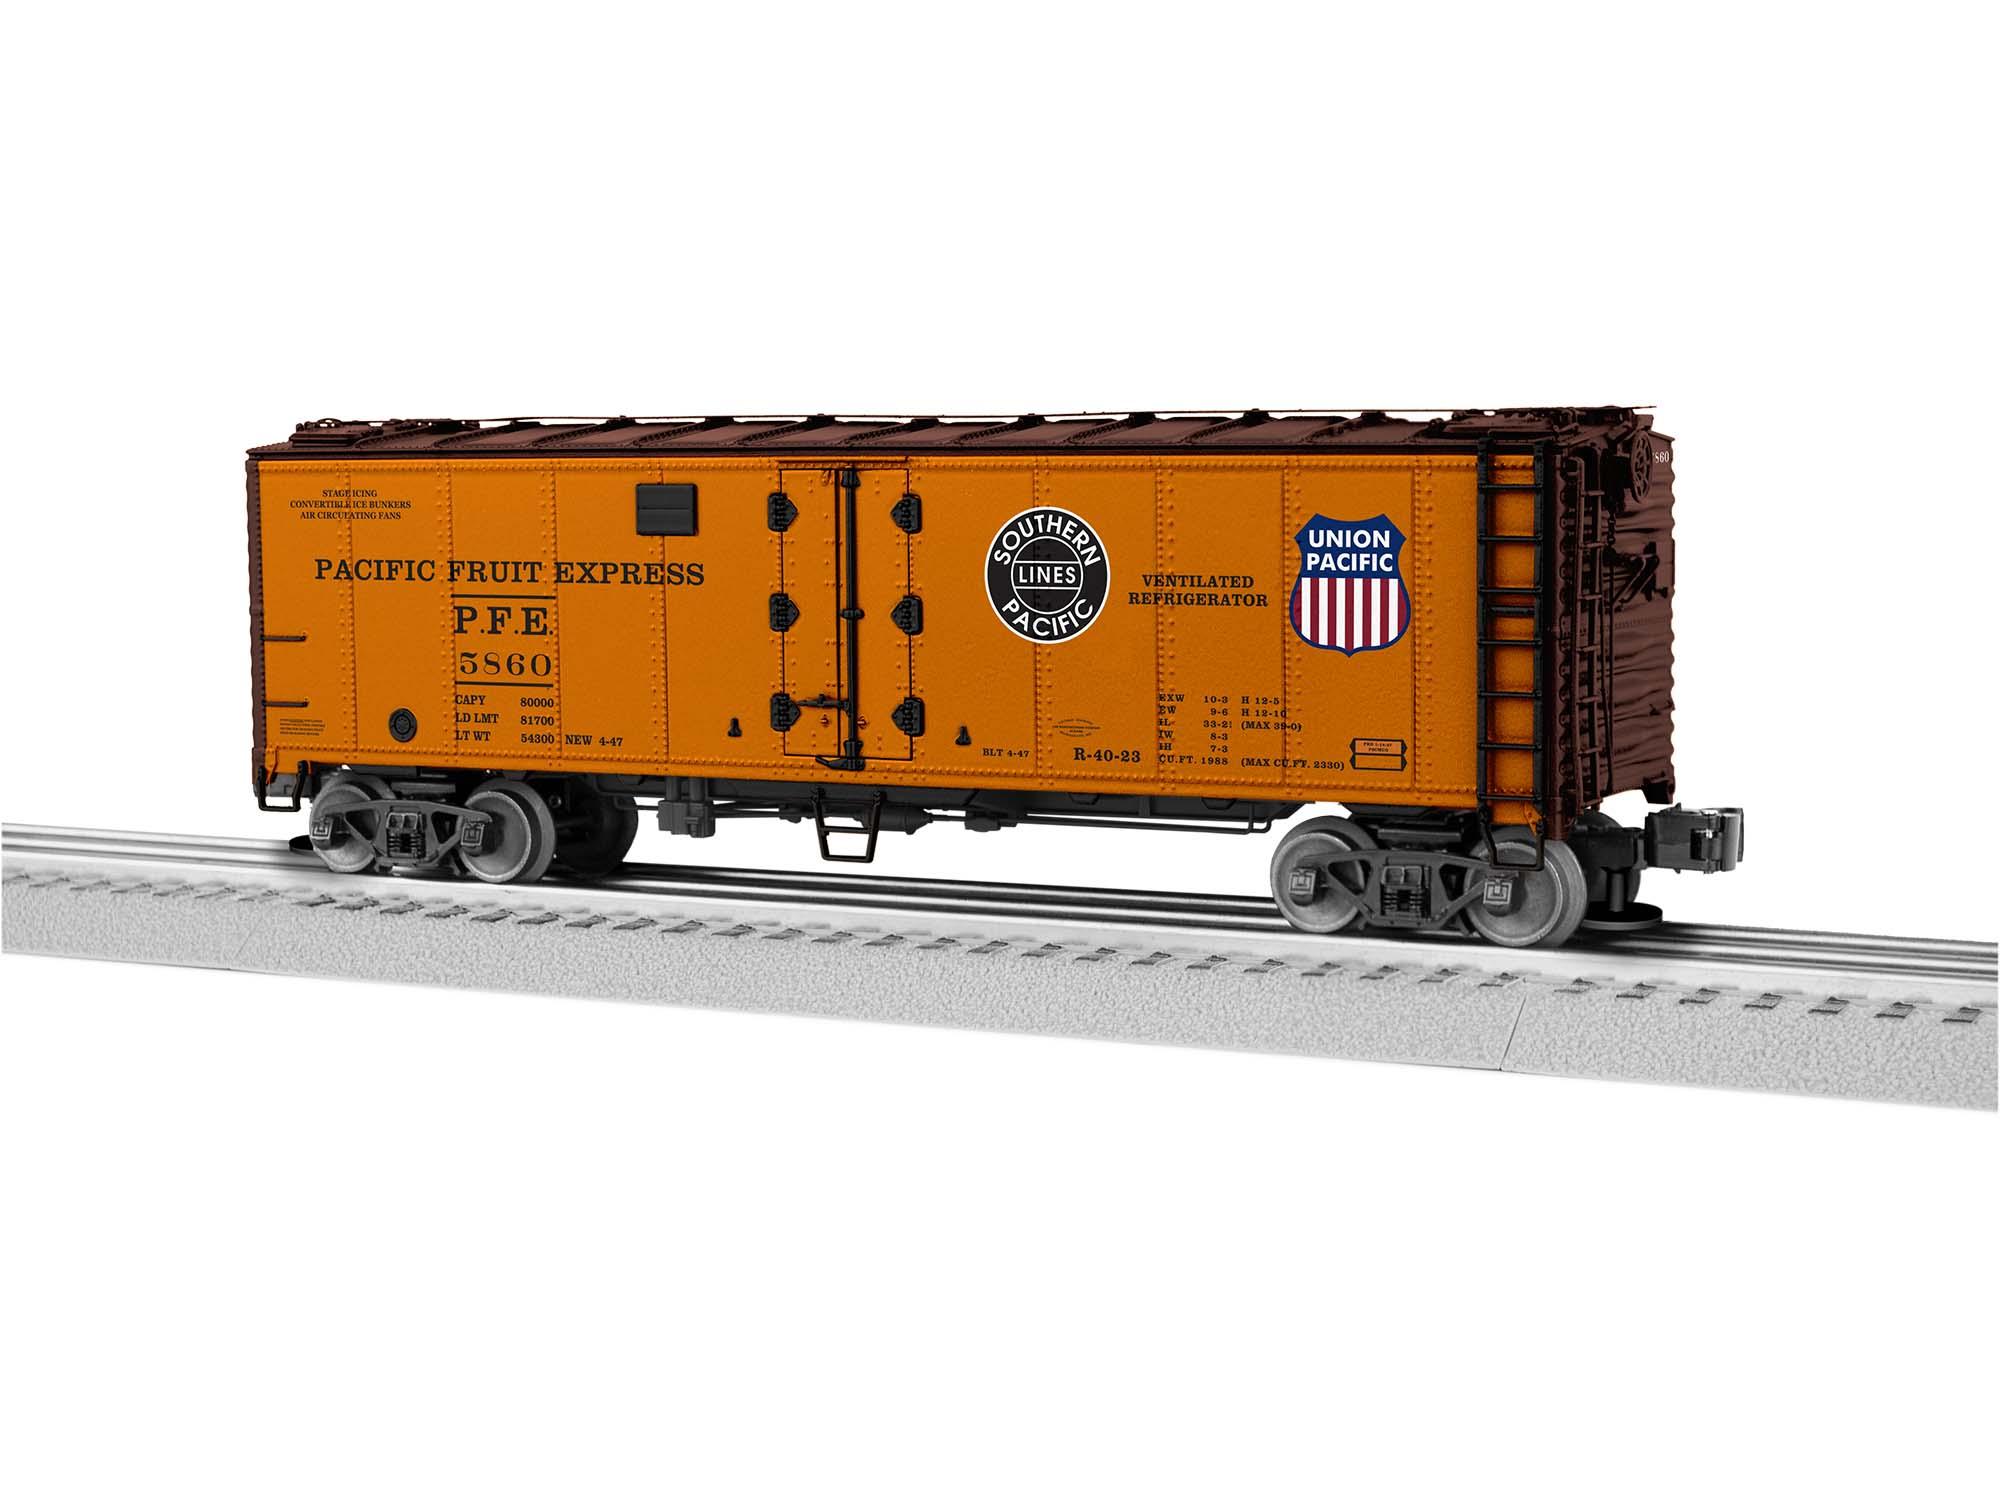 Lionel Trains Pacific Fruit Express Reefer Car